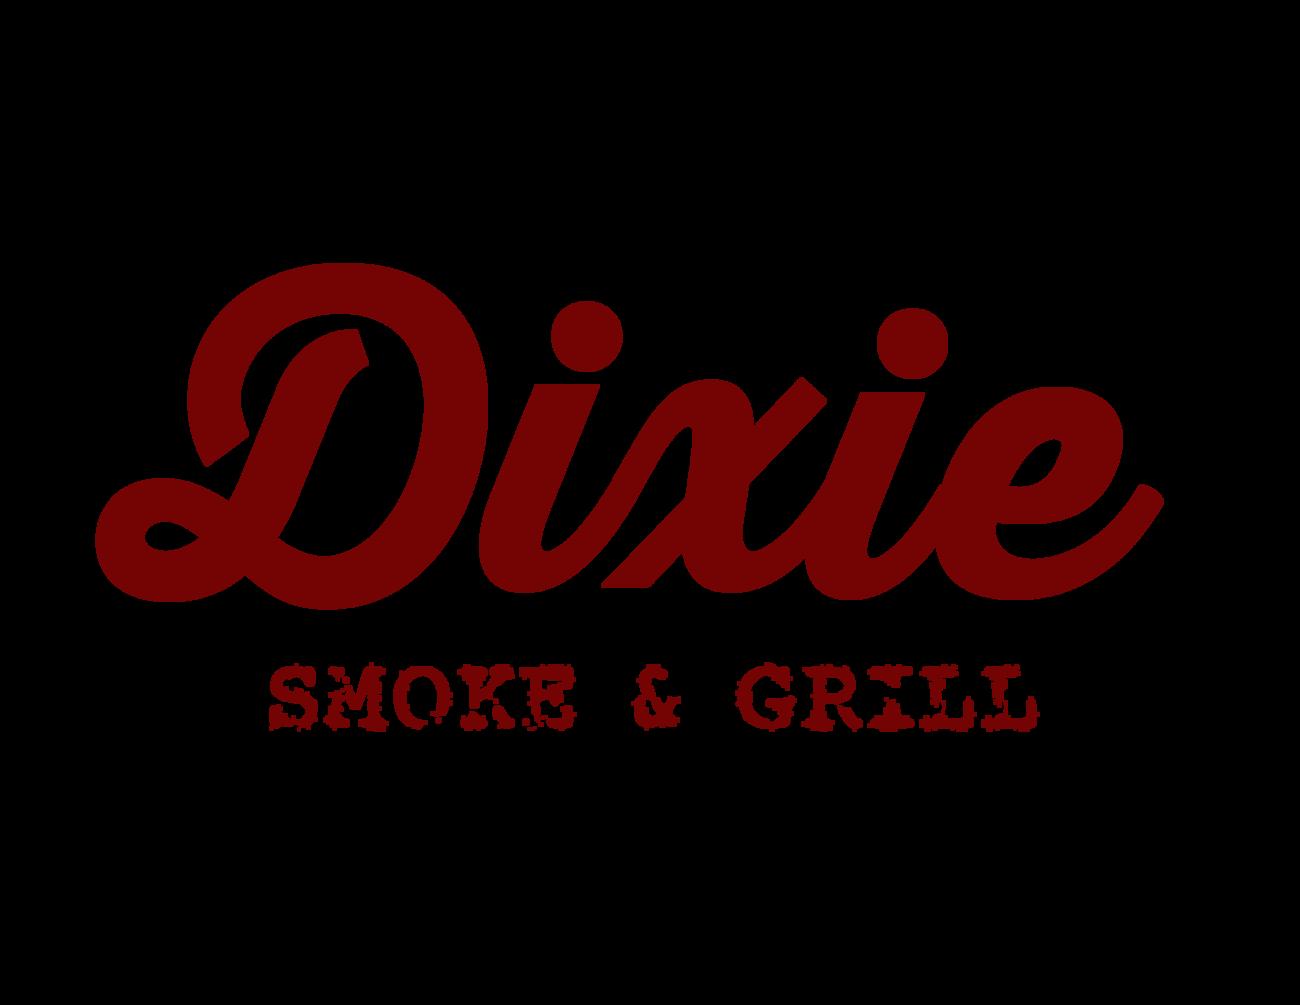 Dixie Smoke & Grill